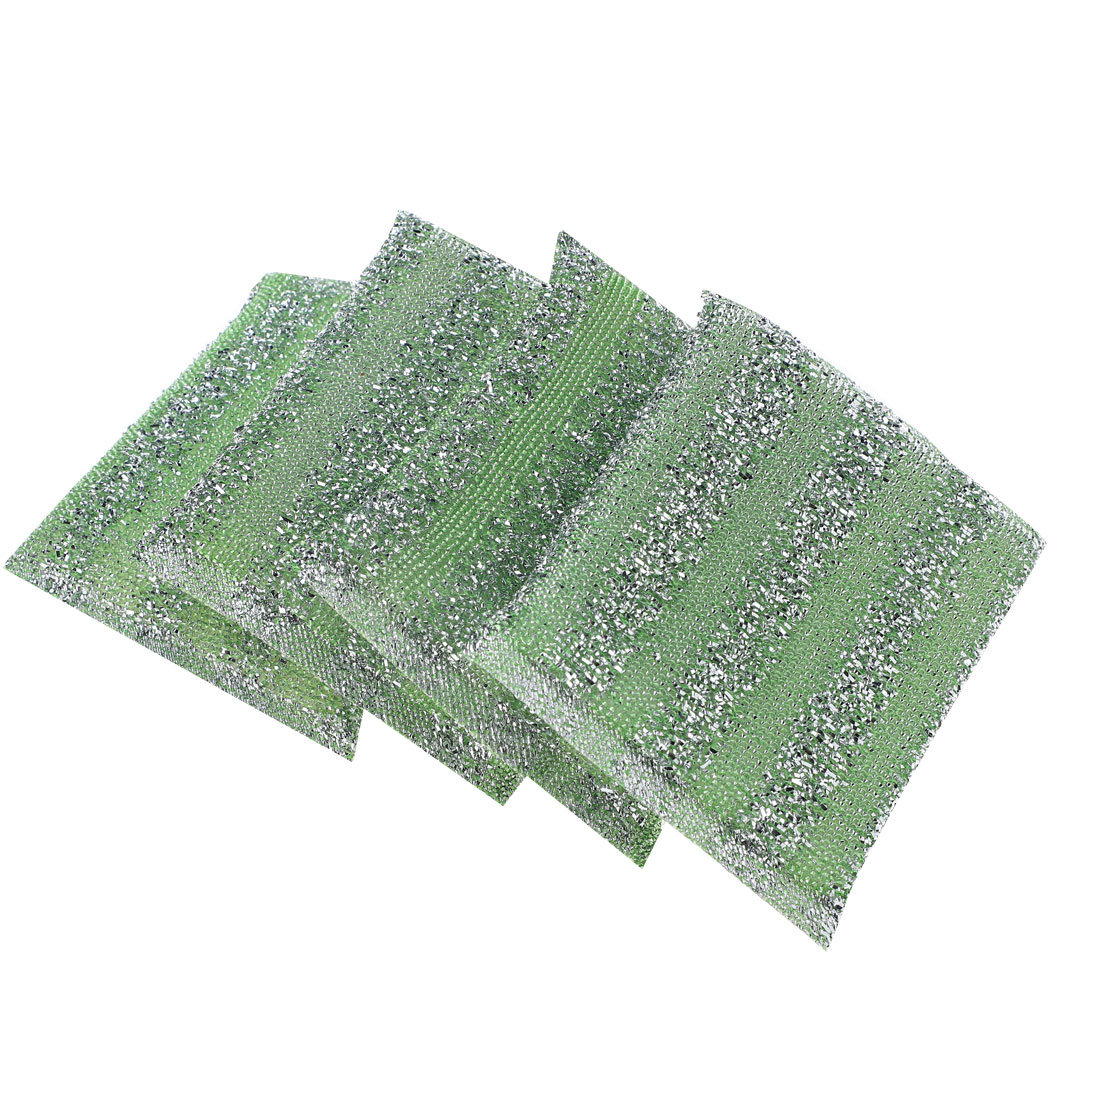 Home Kitchen Bowl Dish Pot Wash Clean Scrub Sponge Cleaning Pads Green 4pcs